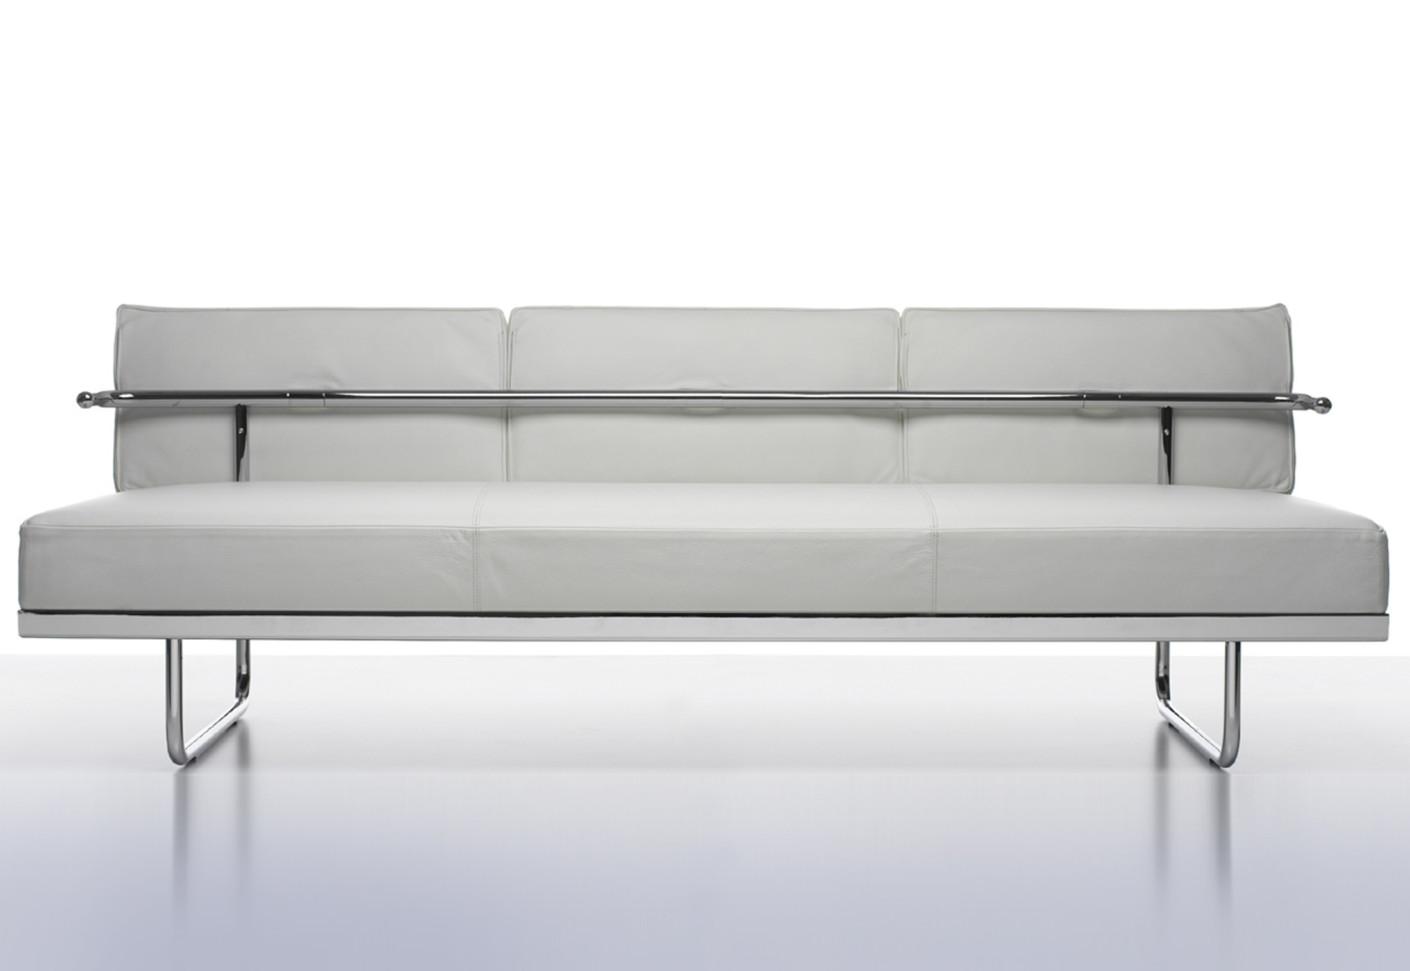 Le Corbusier Sofa Bed Lc5 Black picture on Le Corbusier Sofa Bed Lc5 Blacklc5 f with Le Corbusier Sofa Bed Lc5 Black, sofa c275c187b1a59d3dabfb554df93b9ccb